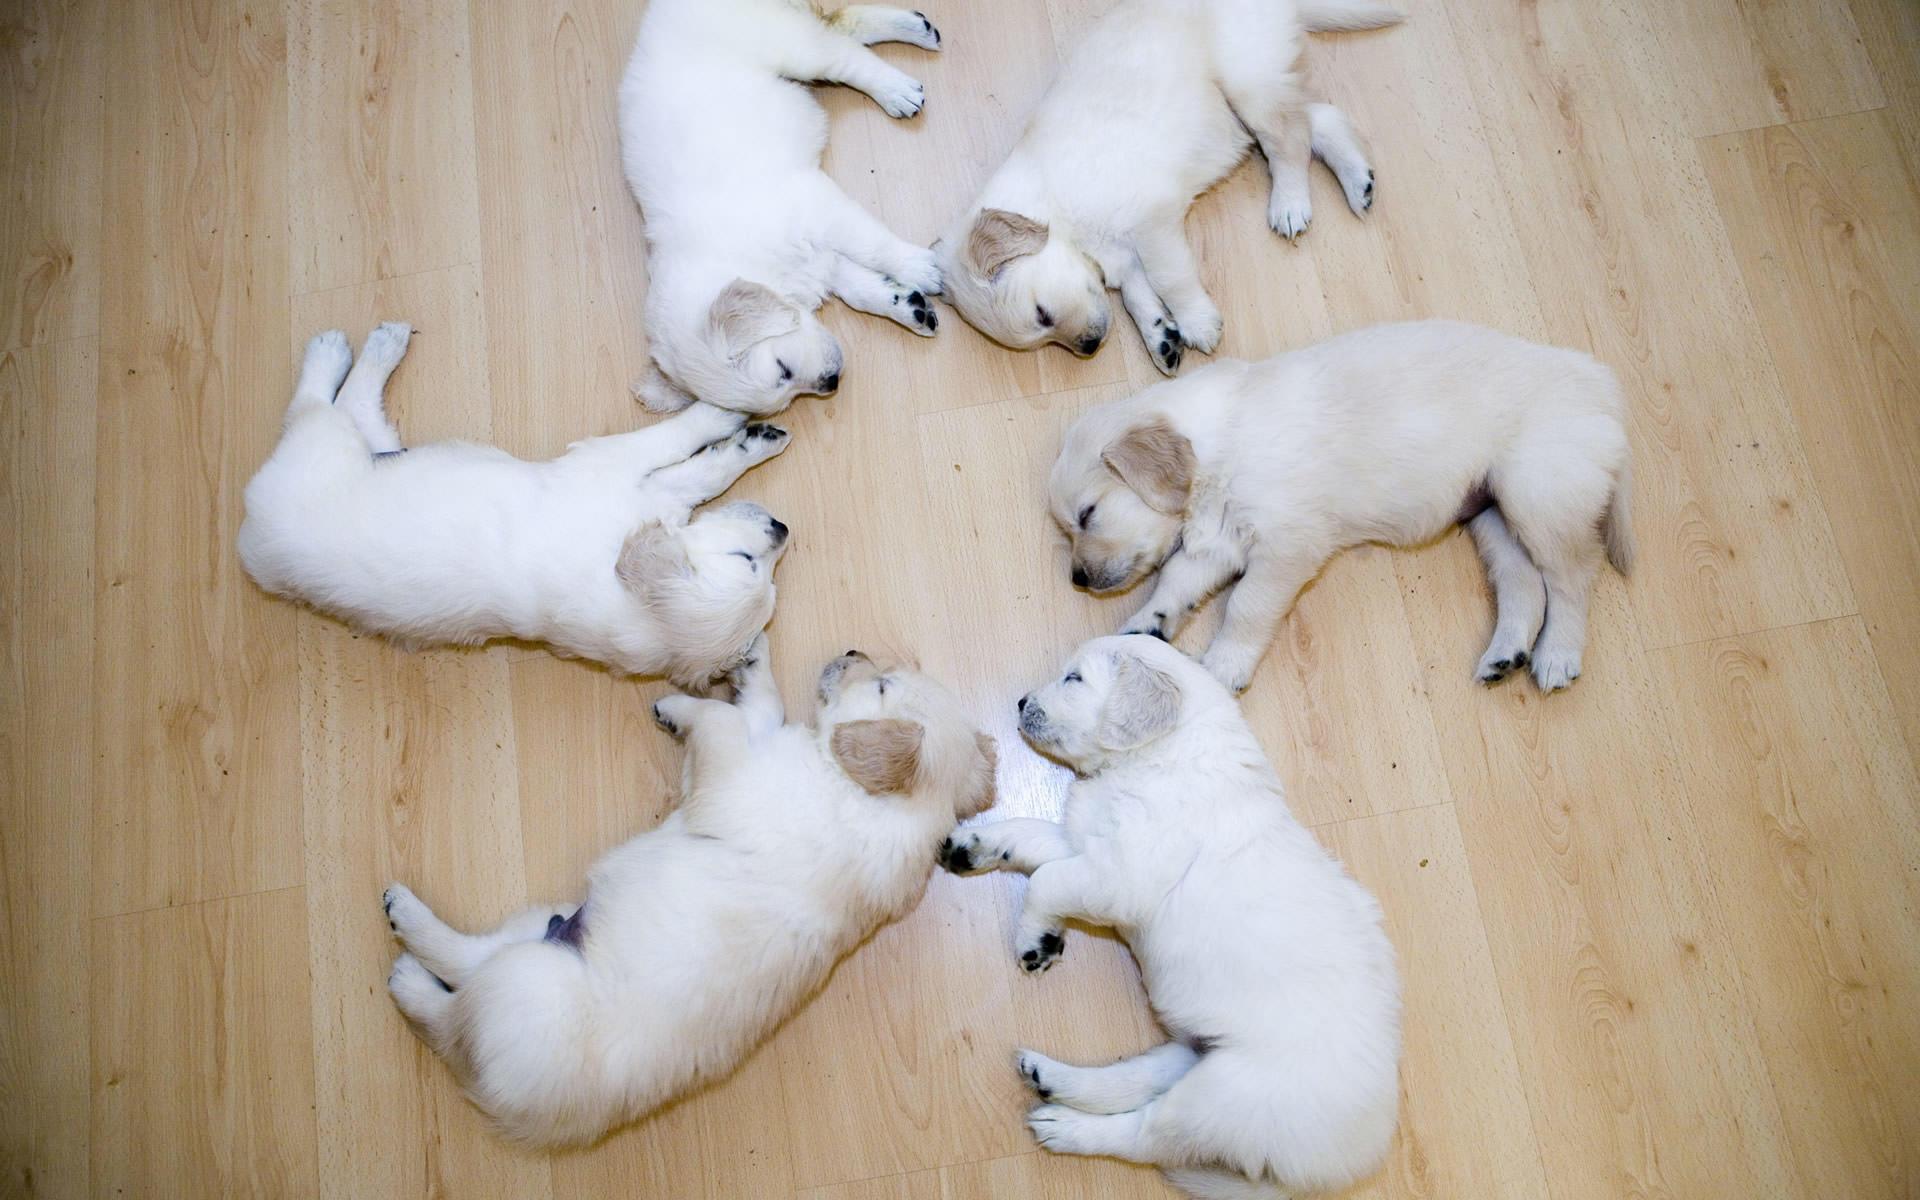 comwallpapersanimal wallpapersdoerscute puppies wallpaper 1920x1200